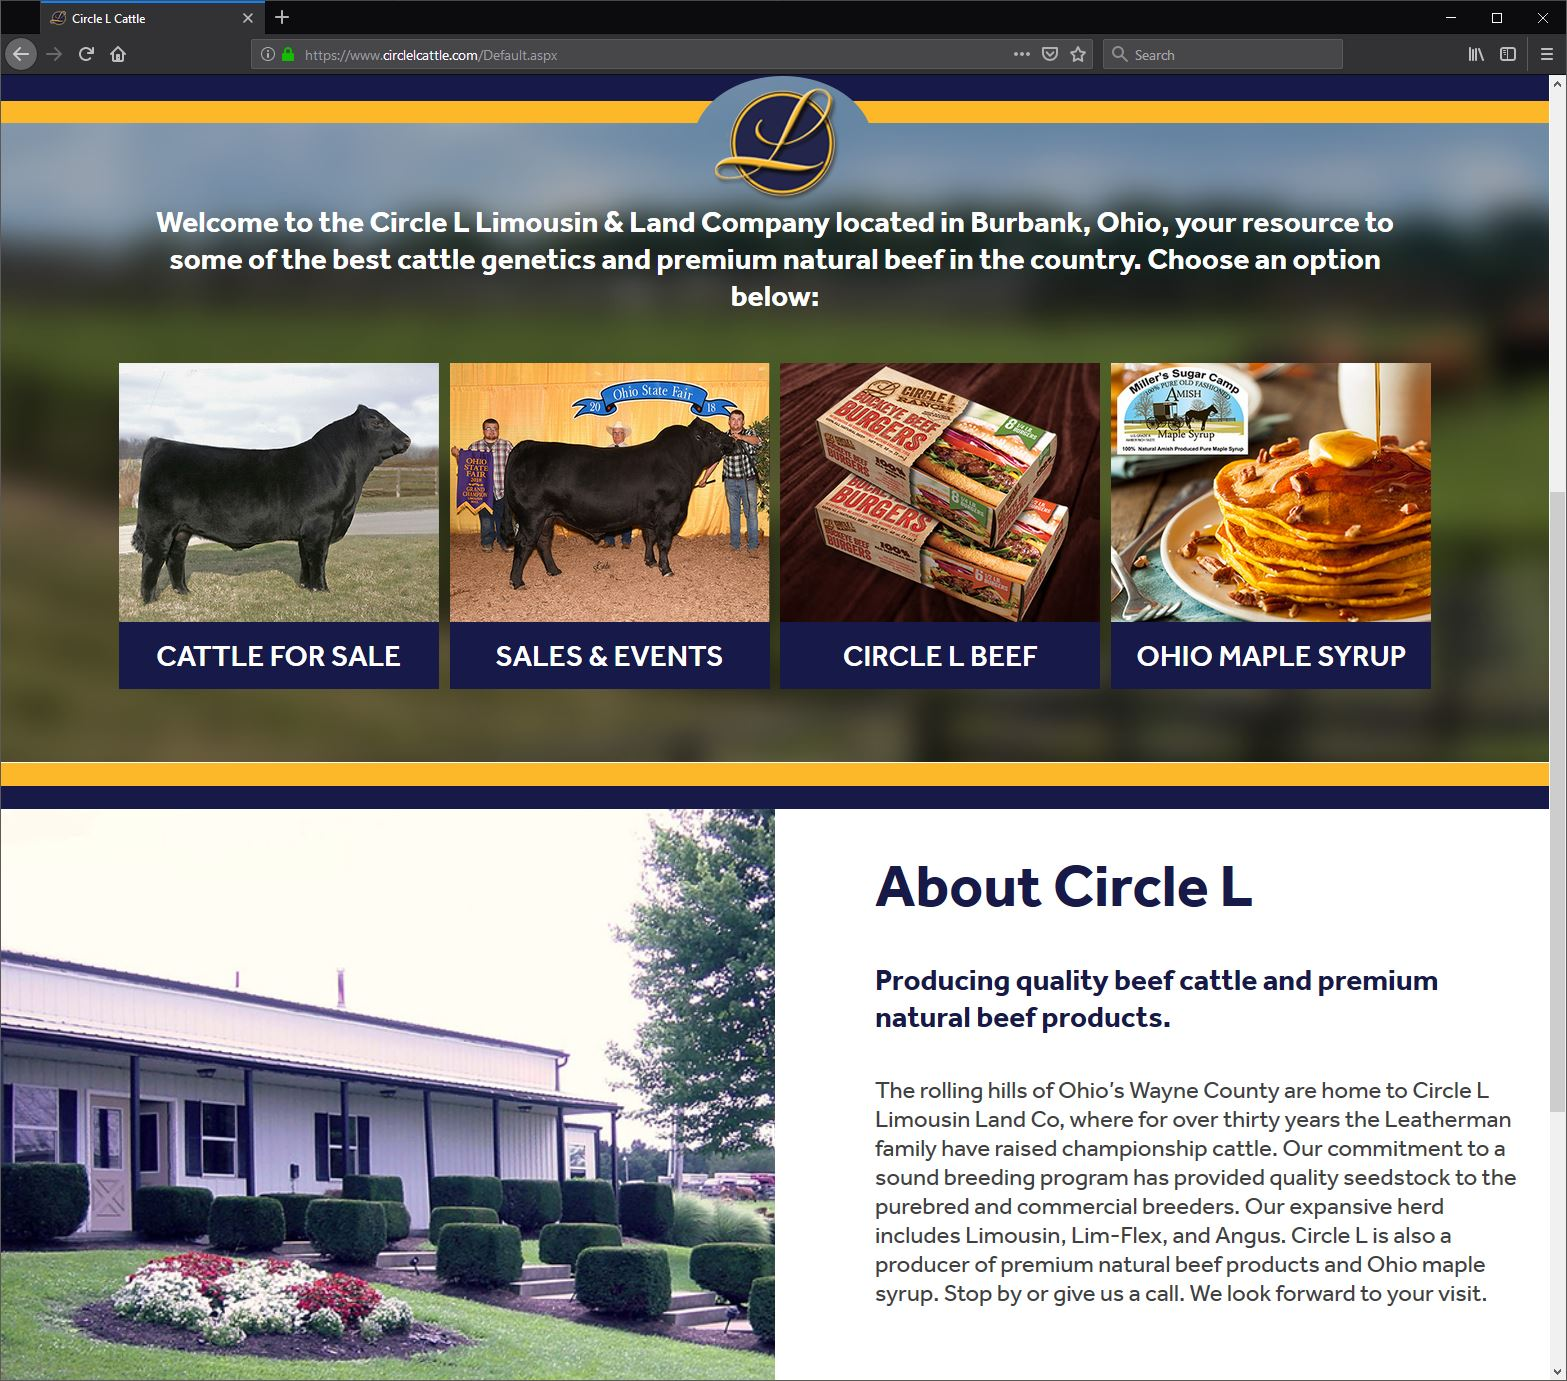 web design companies in akron ohio